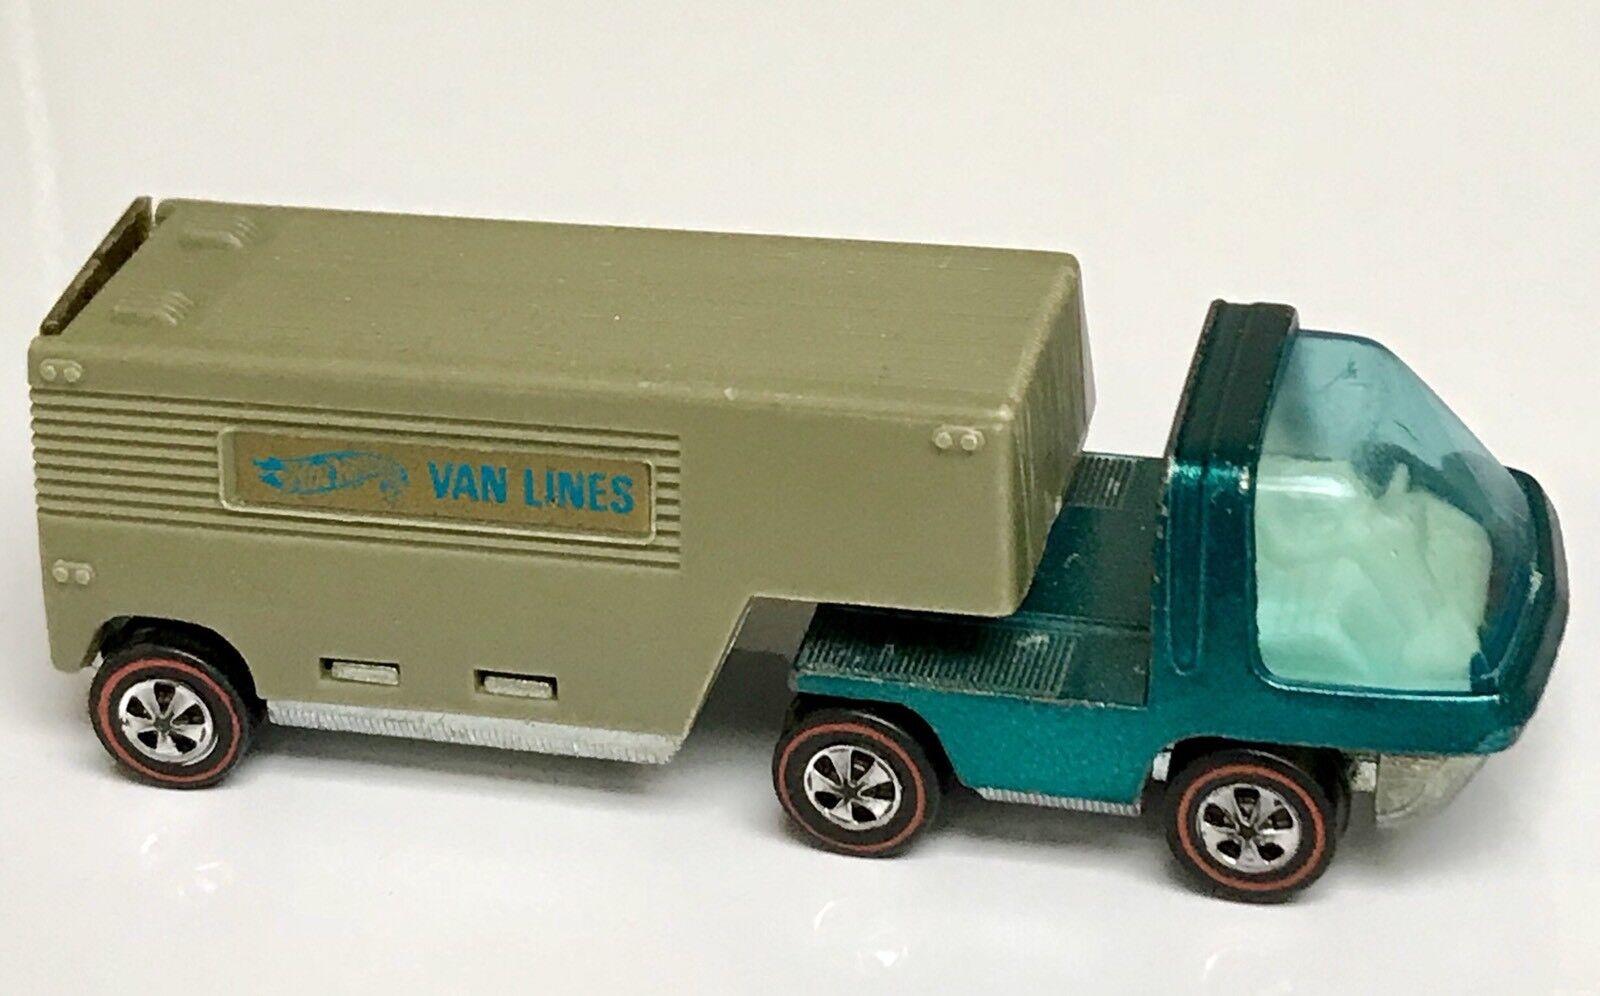 Hot Wheels Redline Aqua Heavyweights Moving Van Lines White Interior!